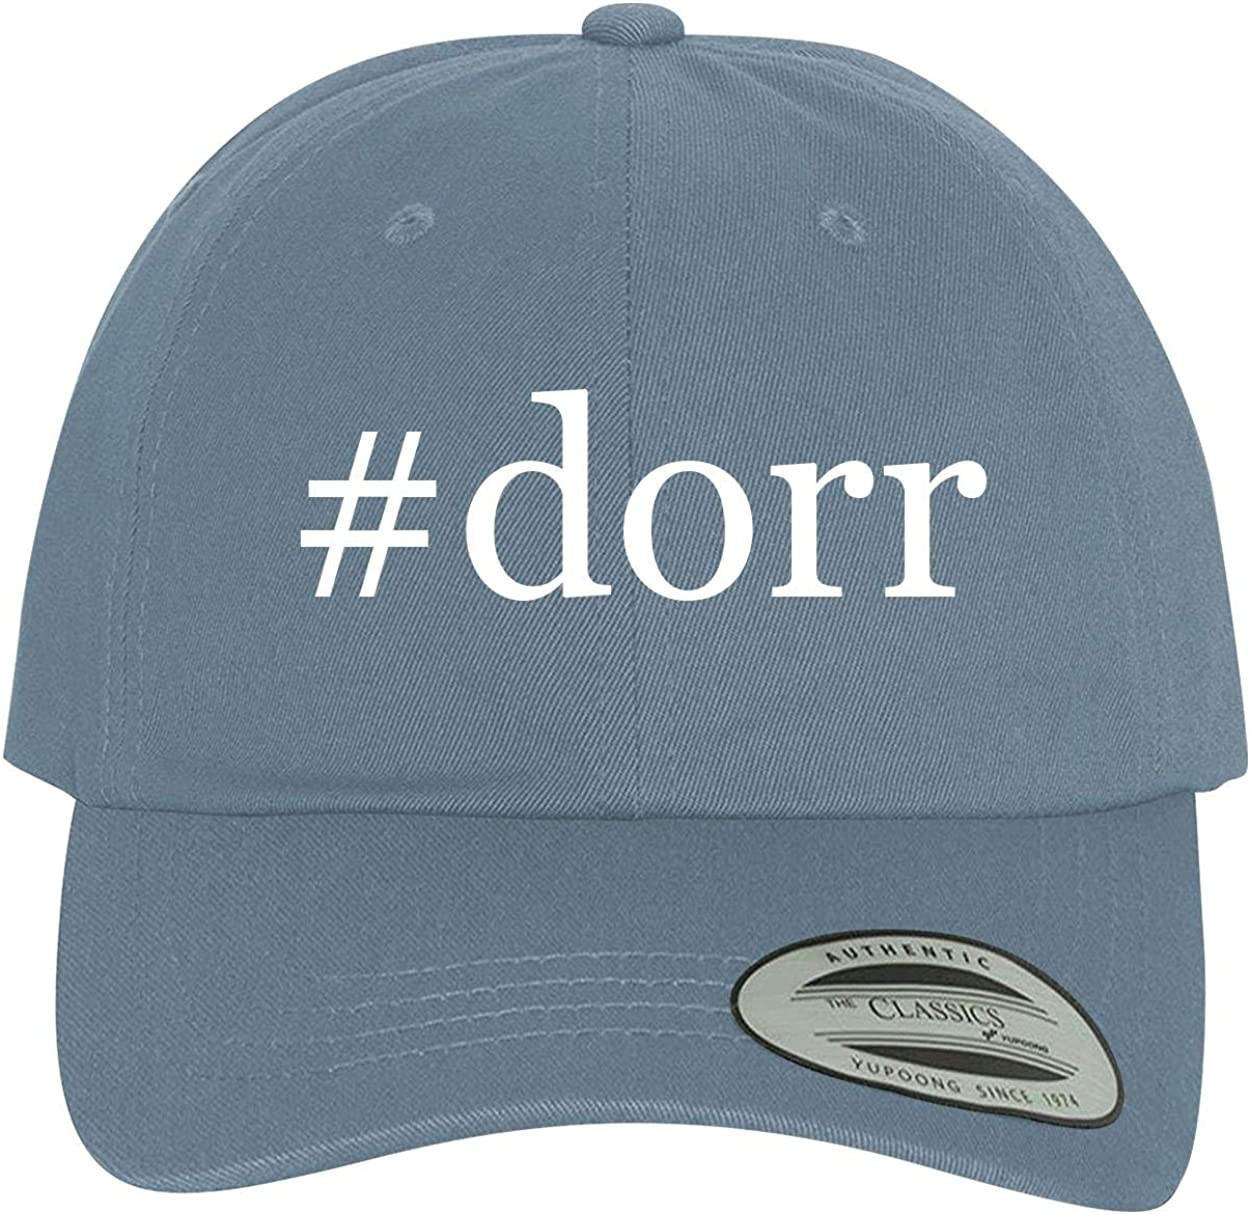 BH Cool Designs #dorr Comfortable Dad Hat Baseball Cap